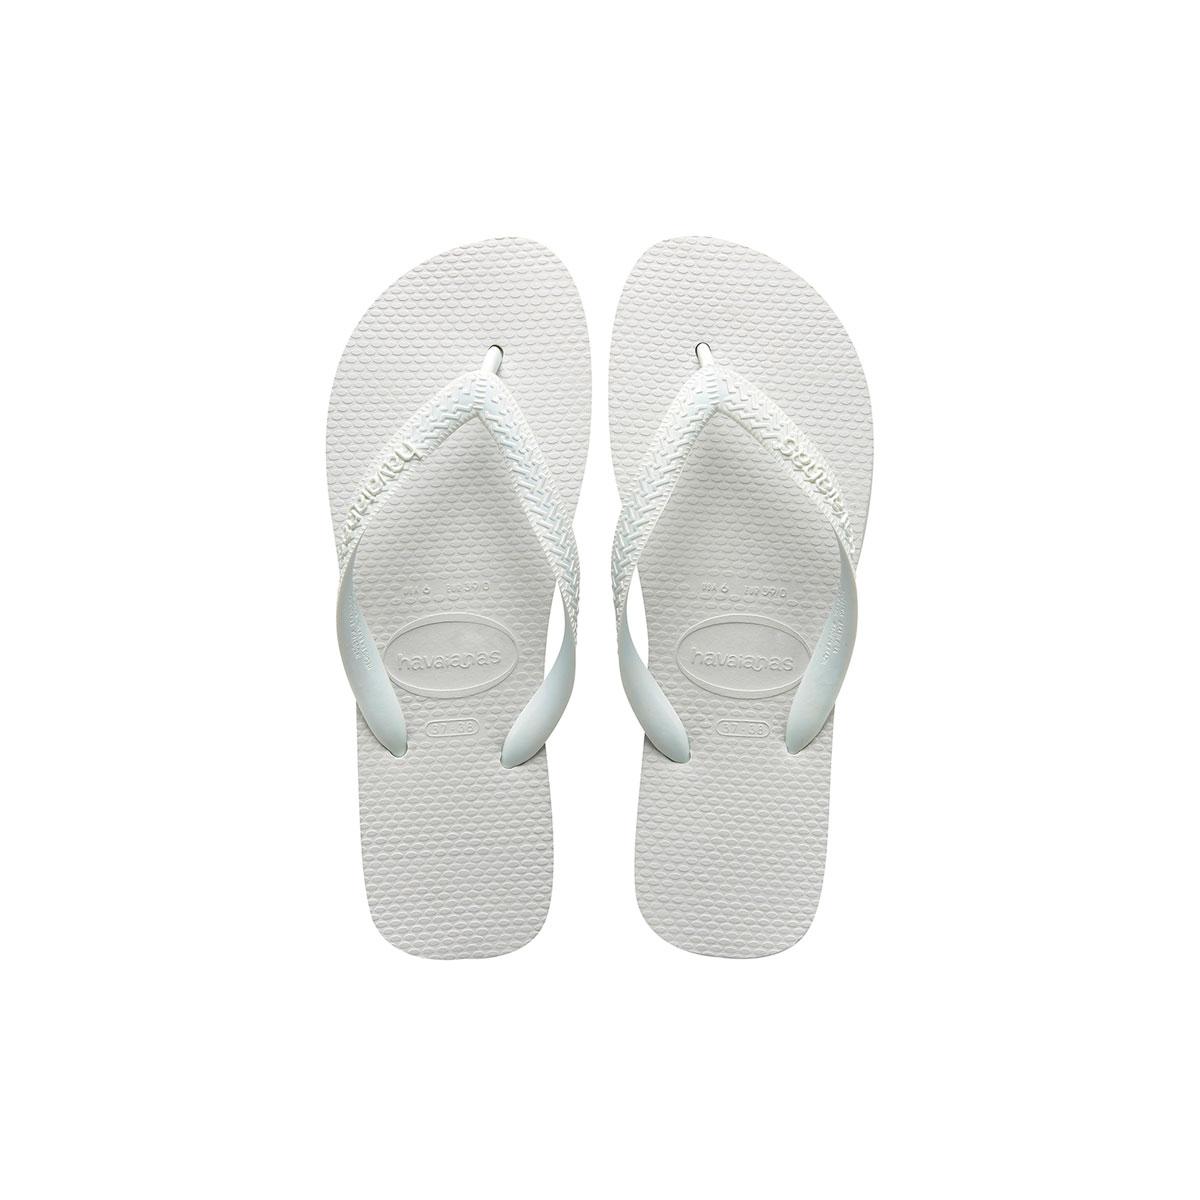 Havaianas White Top Unisex Flip Flops Wedding Gift